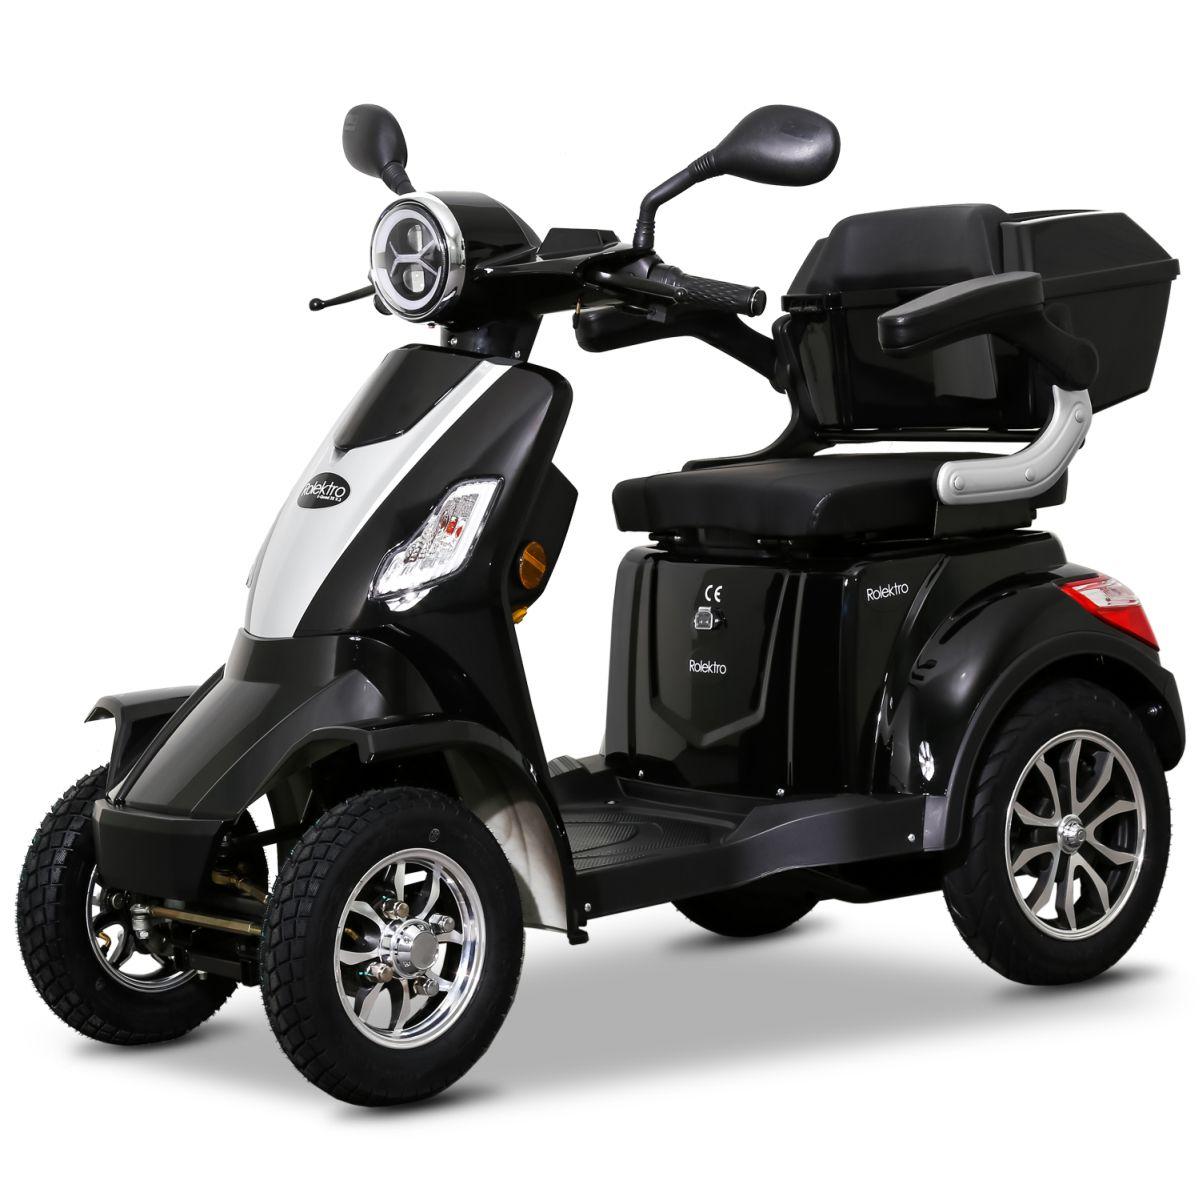 Seniorenmobil Elektromobil Elektroroller Rolektro Quad 25BG schwarz Bild 2